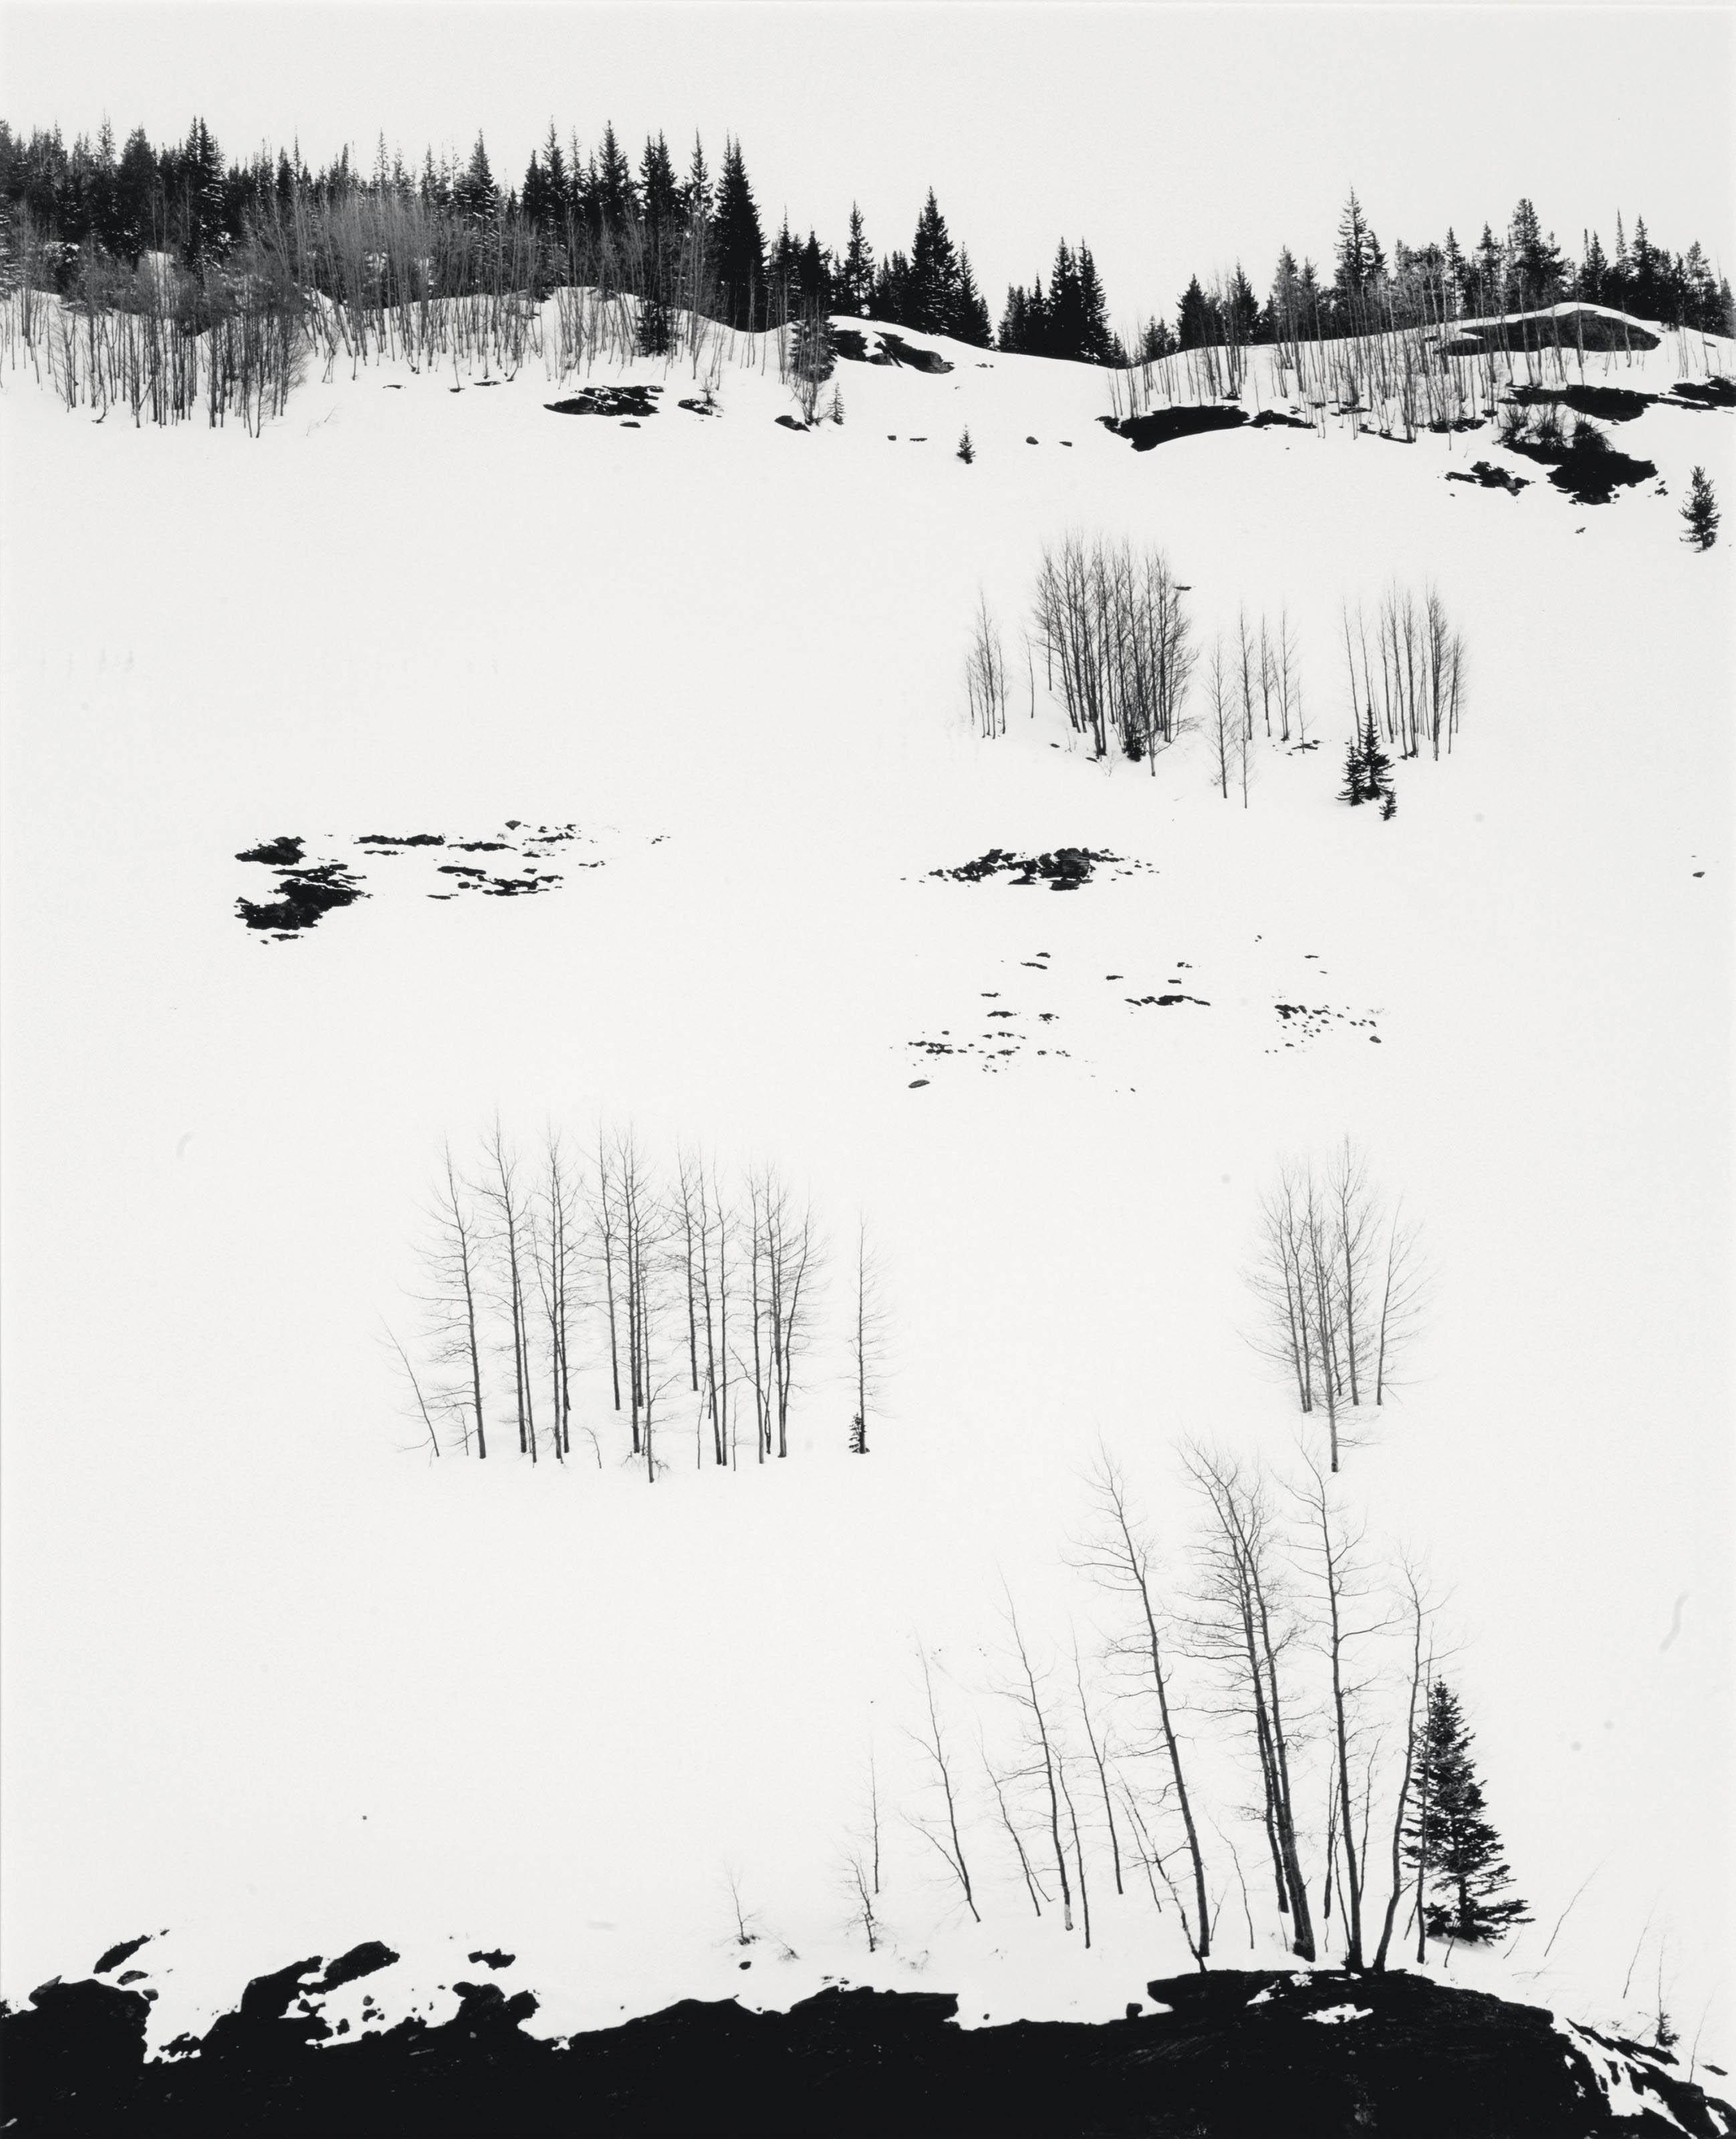 Aspen Trees and Snow, Colorado, 1957